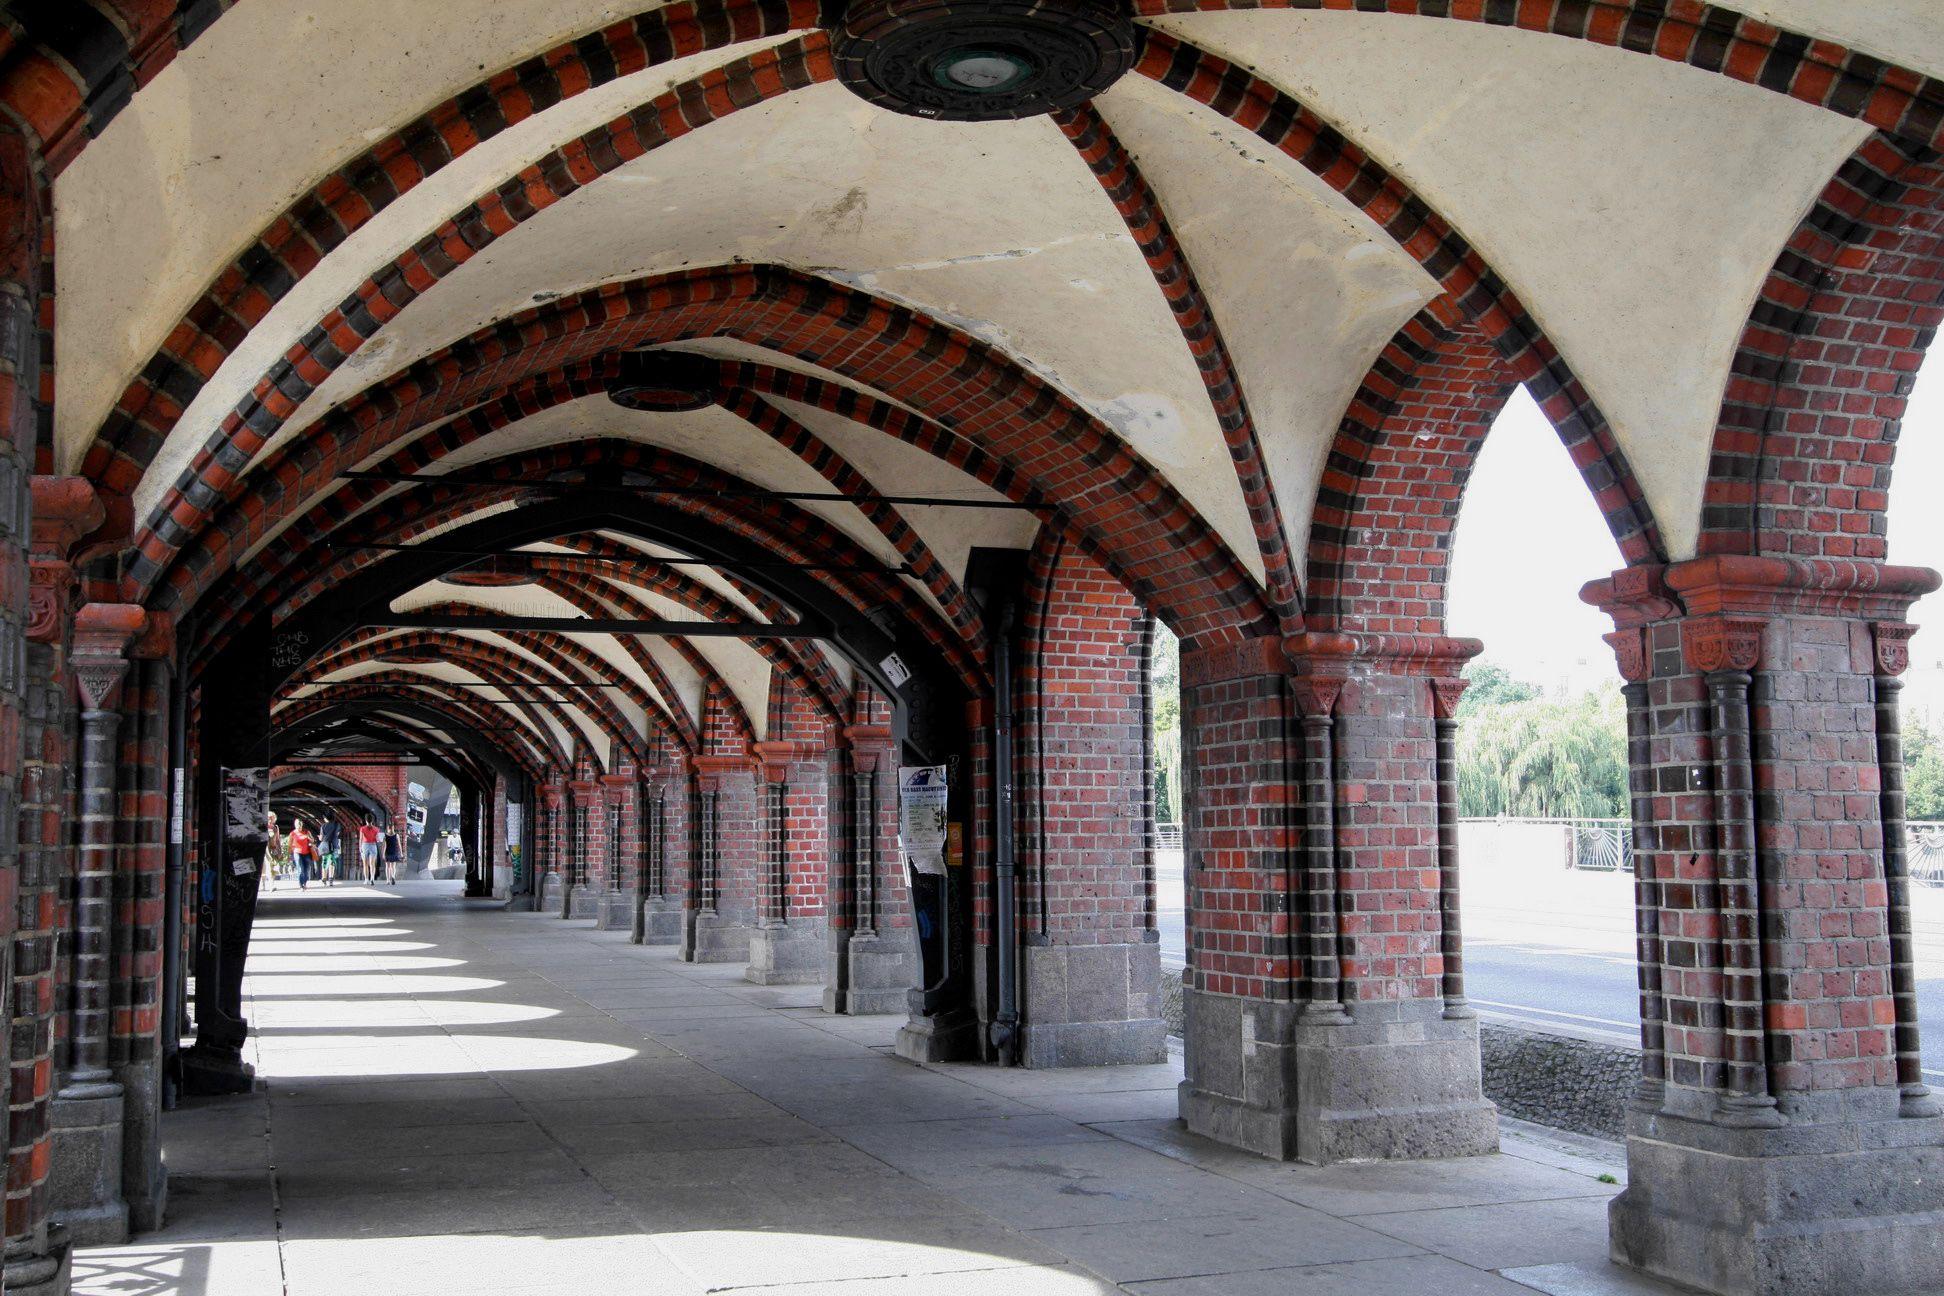 LolaRennt_OberbaumBrucke2.jpg (1944×1296) Brick masonry